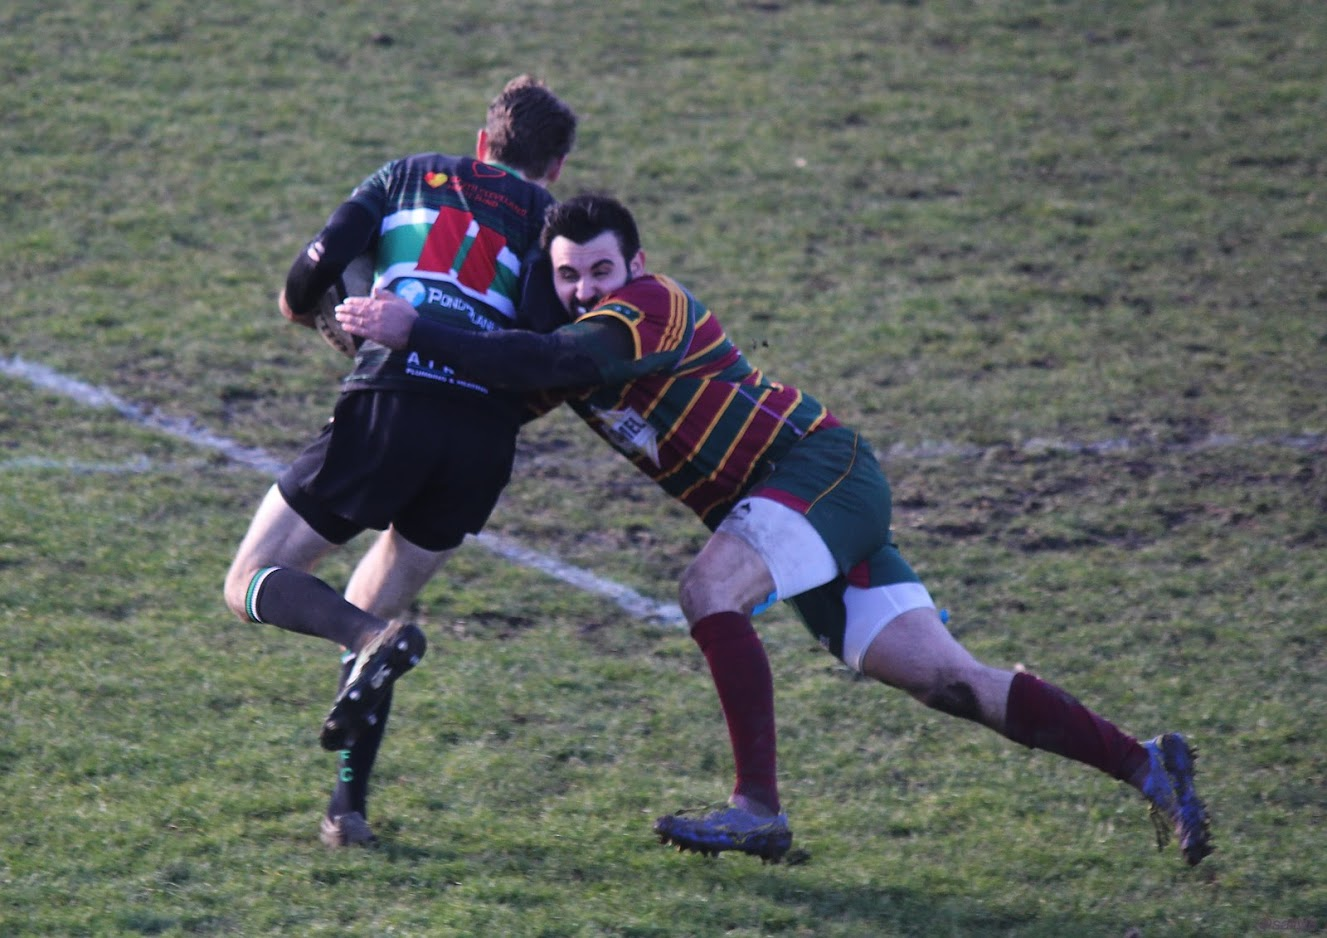 Aycliffe's Heavy Defeat Against League Leaders